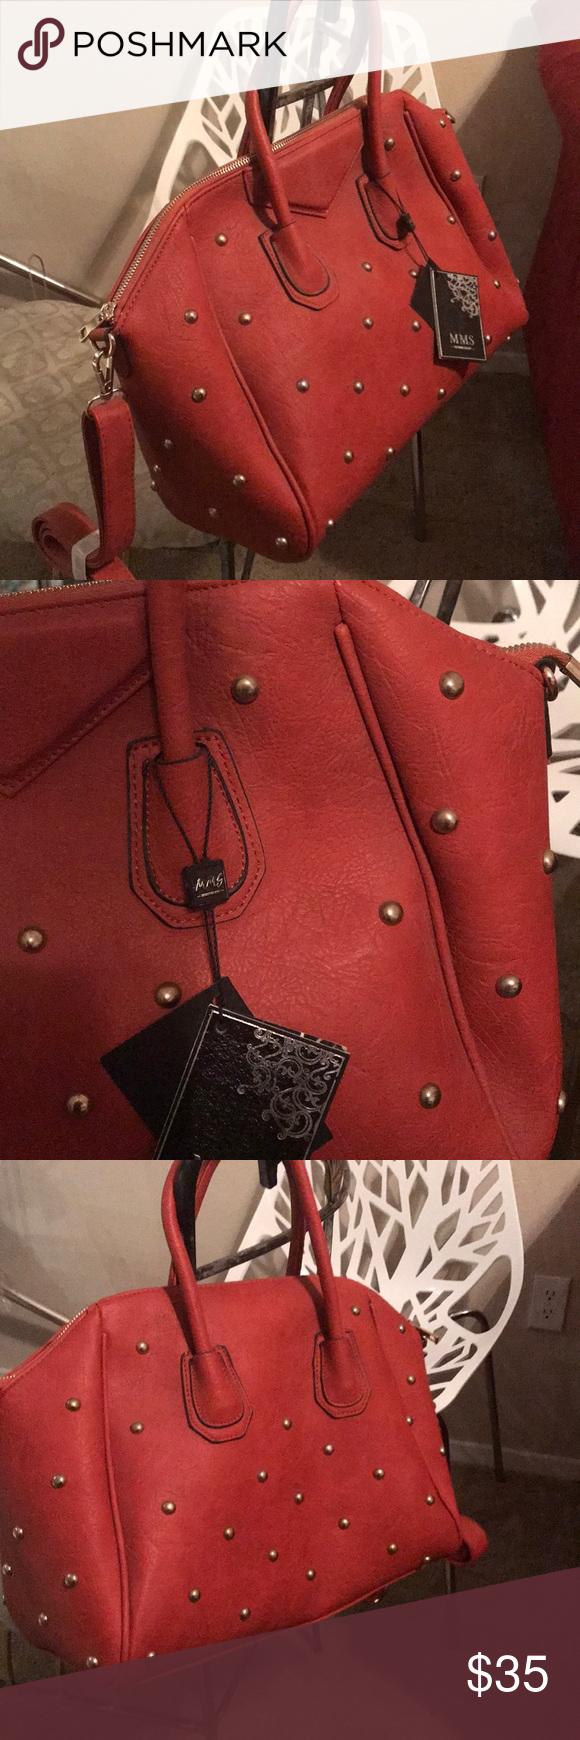 Mms Design Studio Handbag Structured With Studs Includes Detachable Removeable Shoulder Strap Nwt Burnt Orange Color Gold Hardware